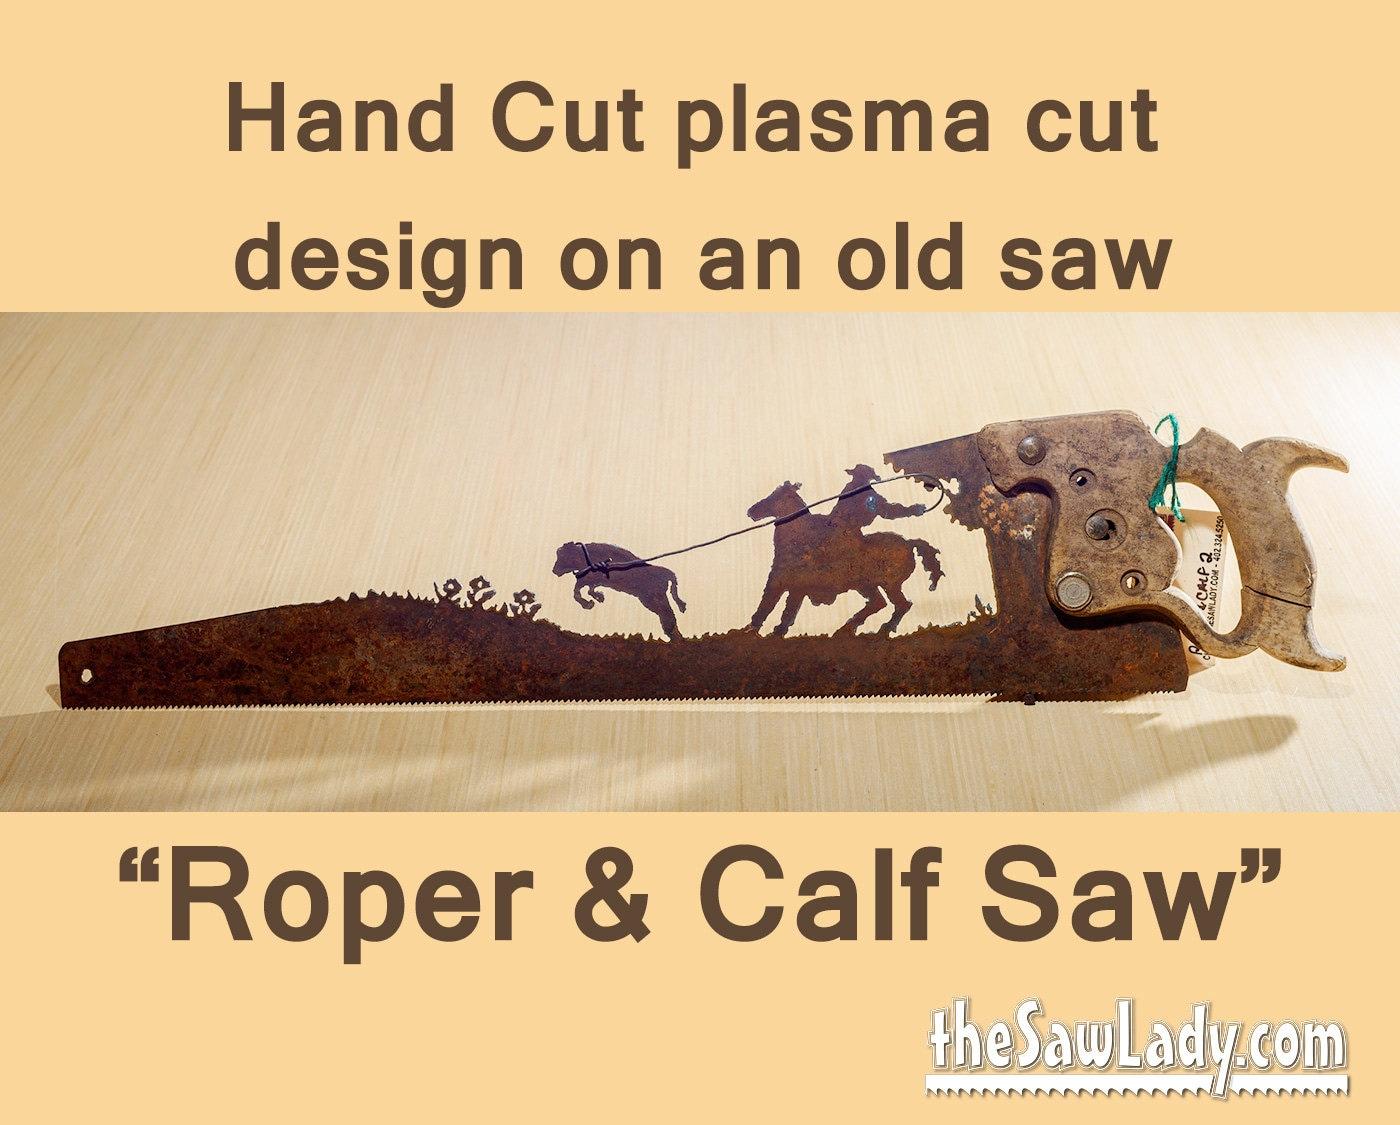 Cowboy Roping a Calf design Hand plasma cut hand saw Metal